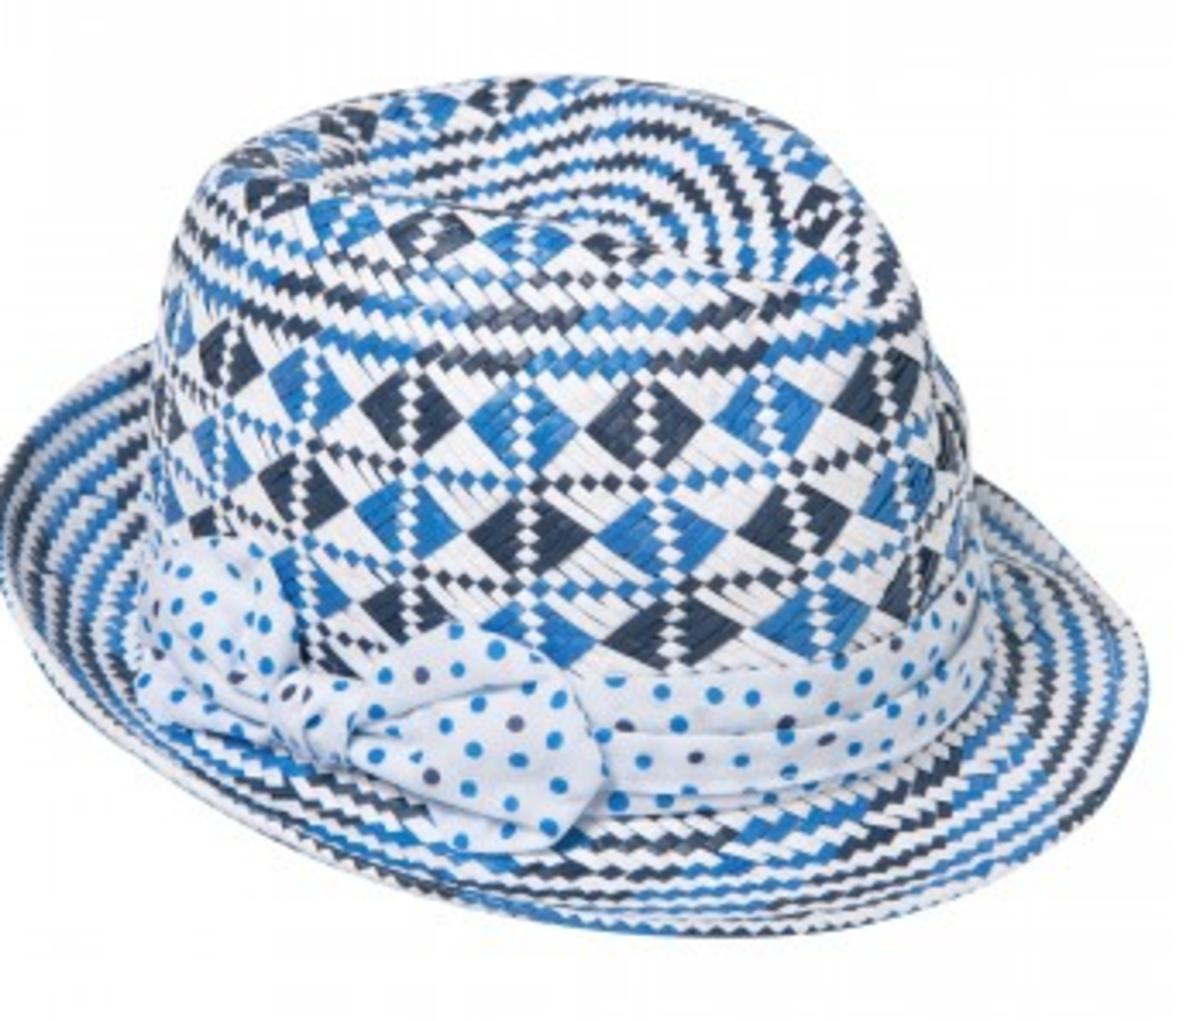 Catamini Hats